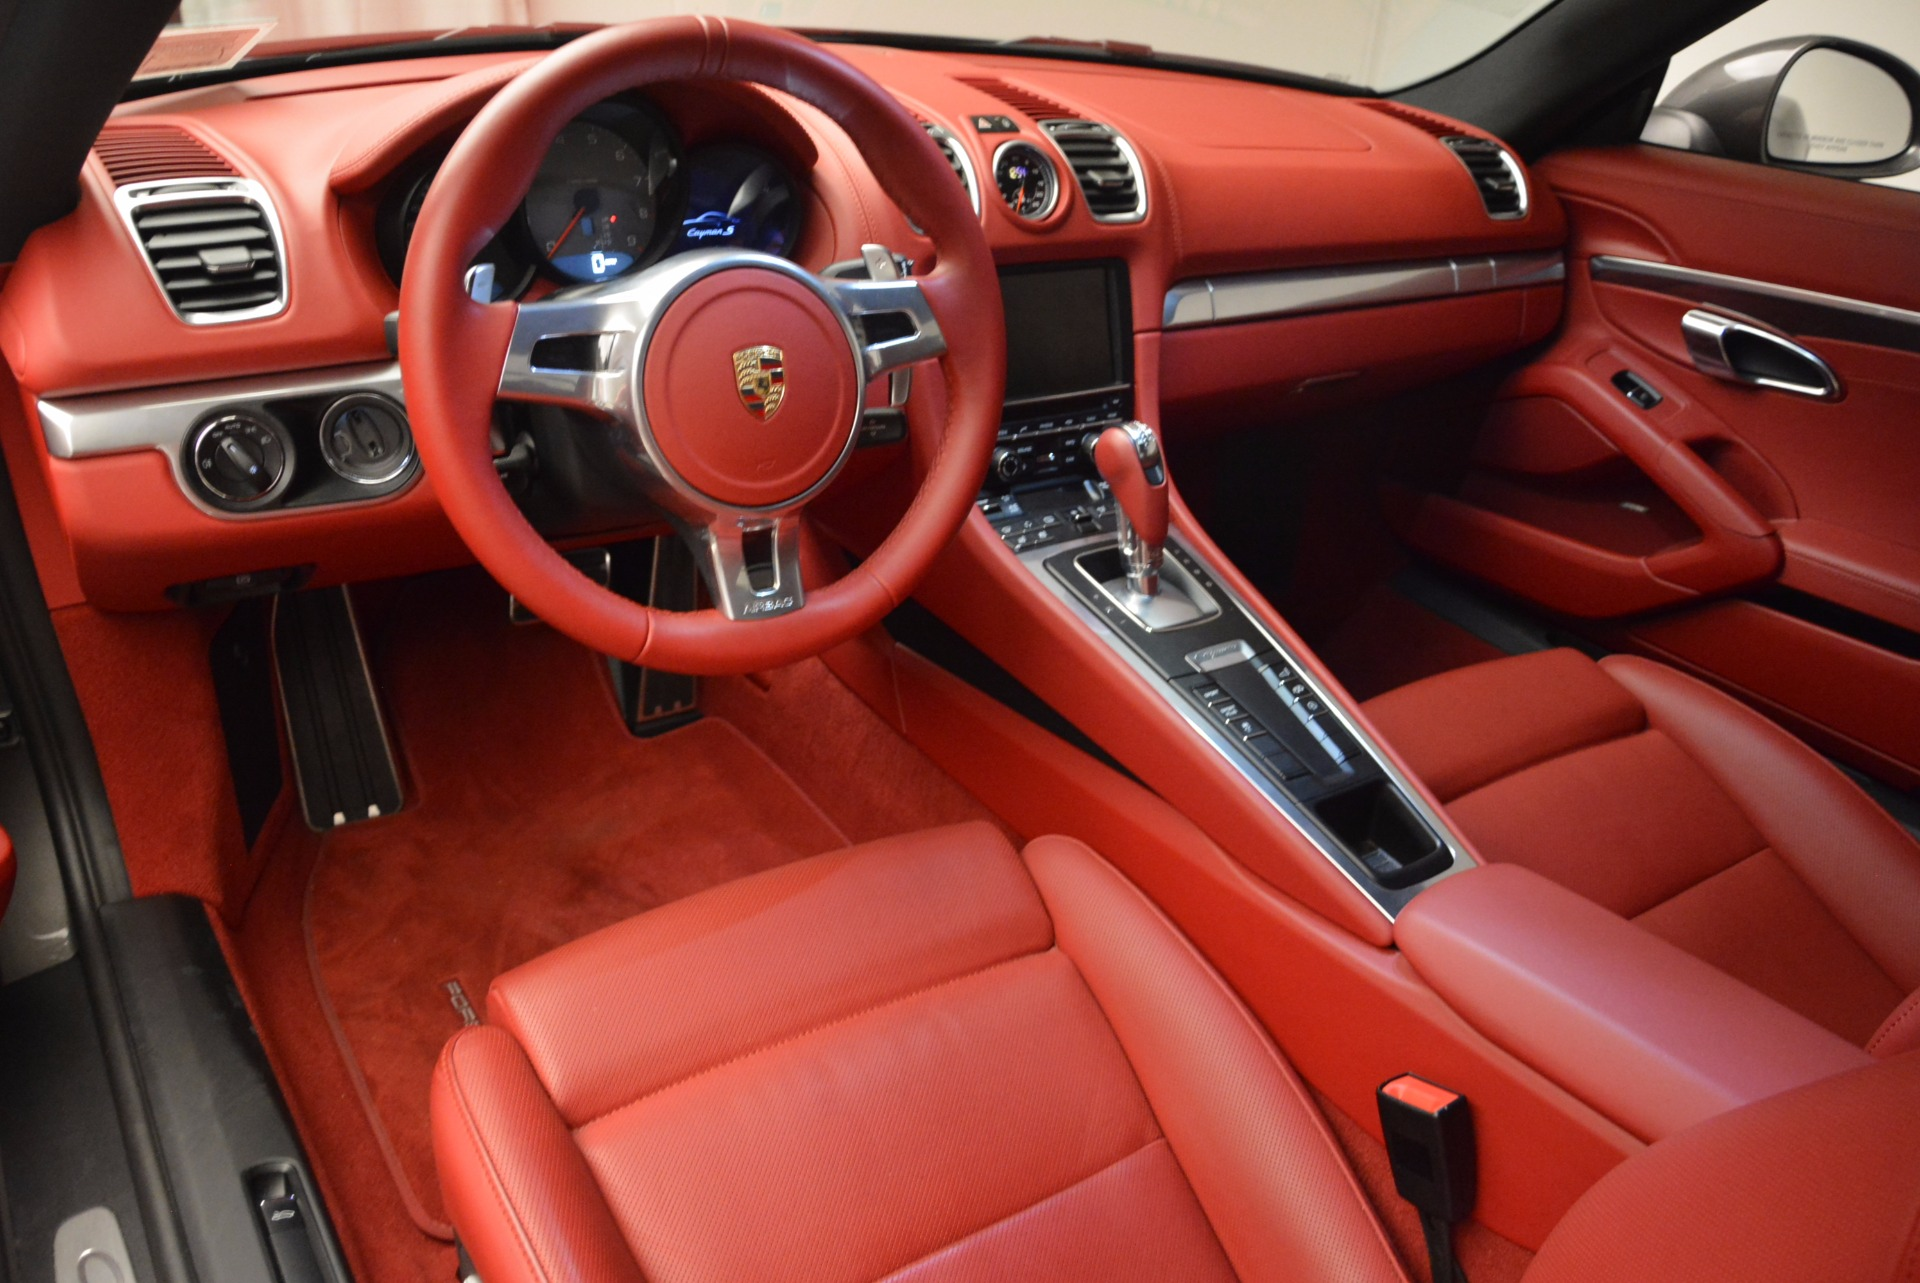 Used 2014 Porsche Cayman S S For Sale In Westport, CT 1612_p13